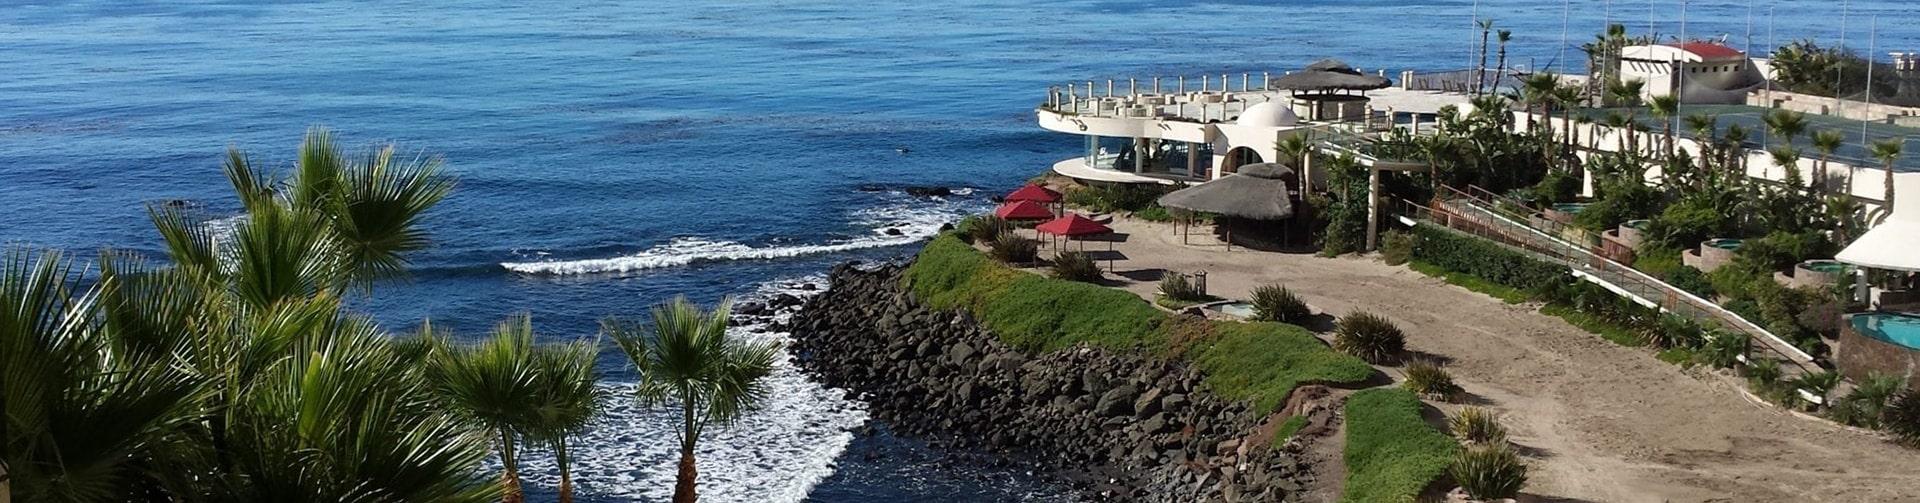 Holistic Sanctuary Baja Aerial View